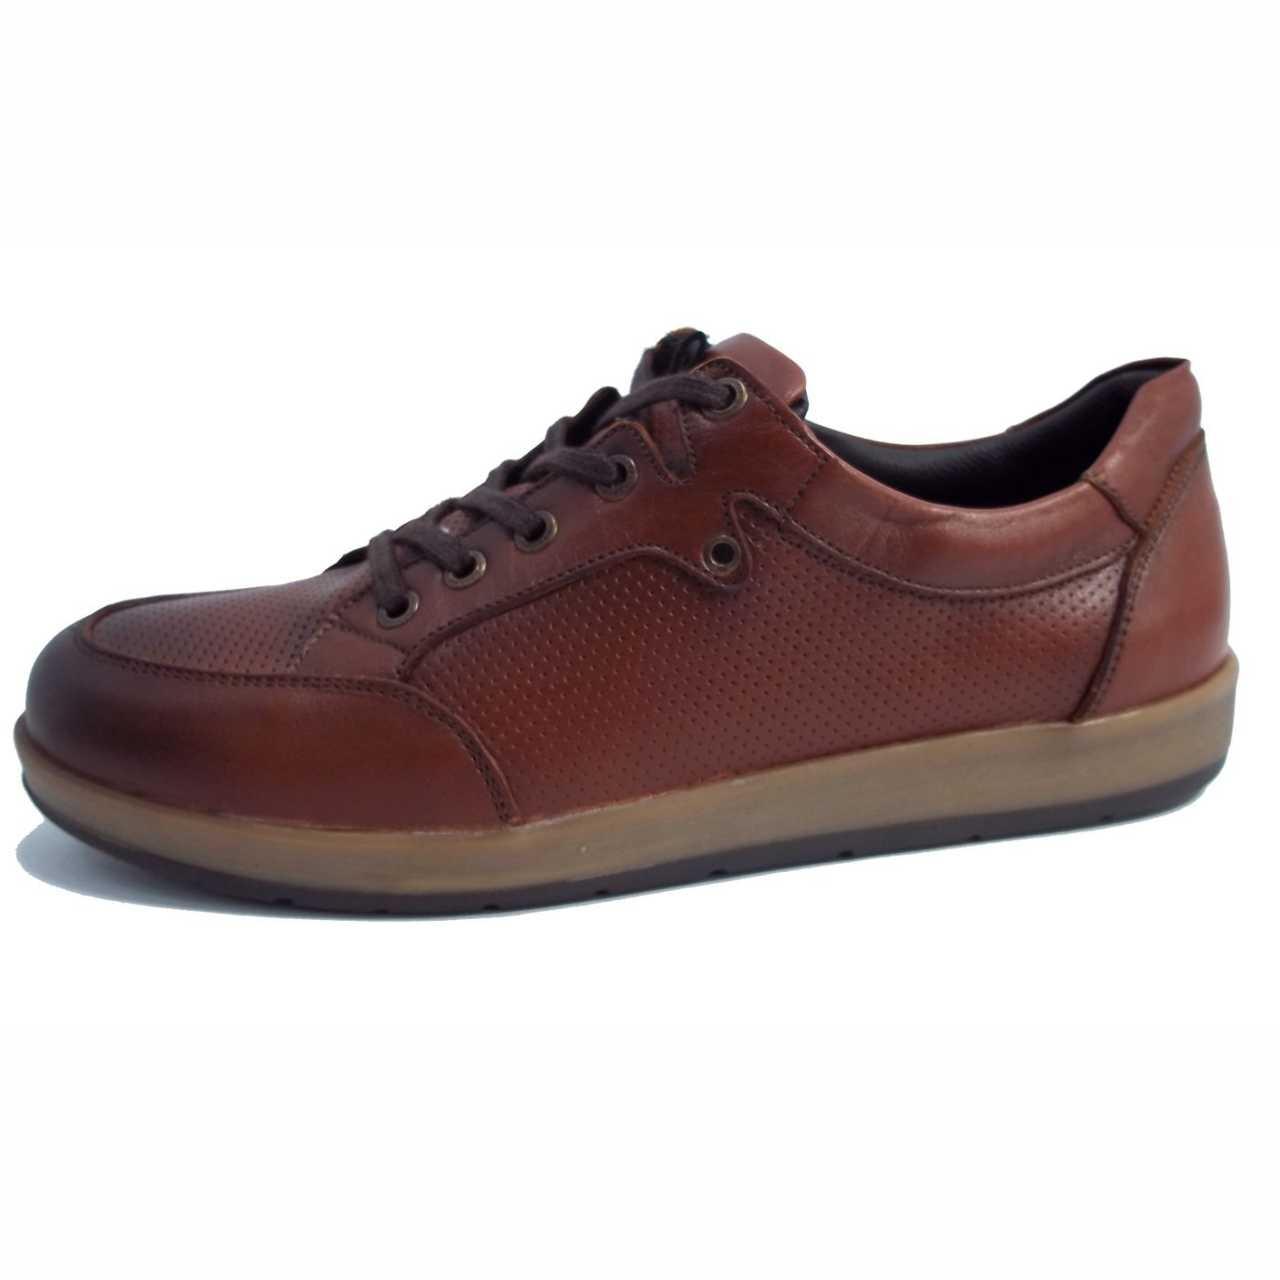 کفش اسپرت چرم کترپیلار مدل پانچی قهوه ای روشن